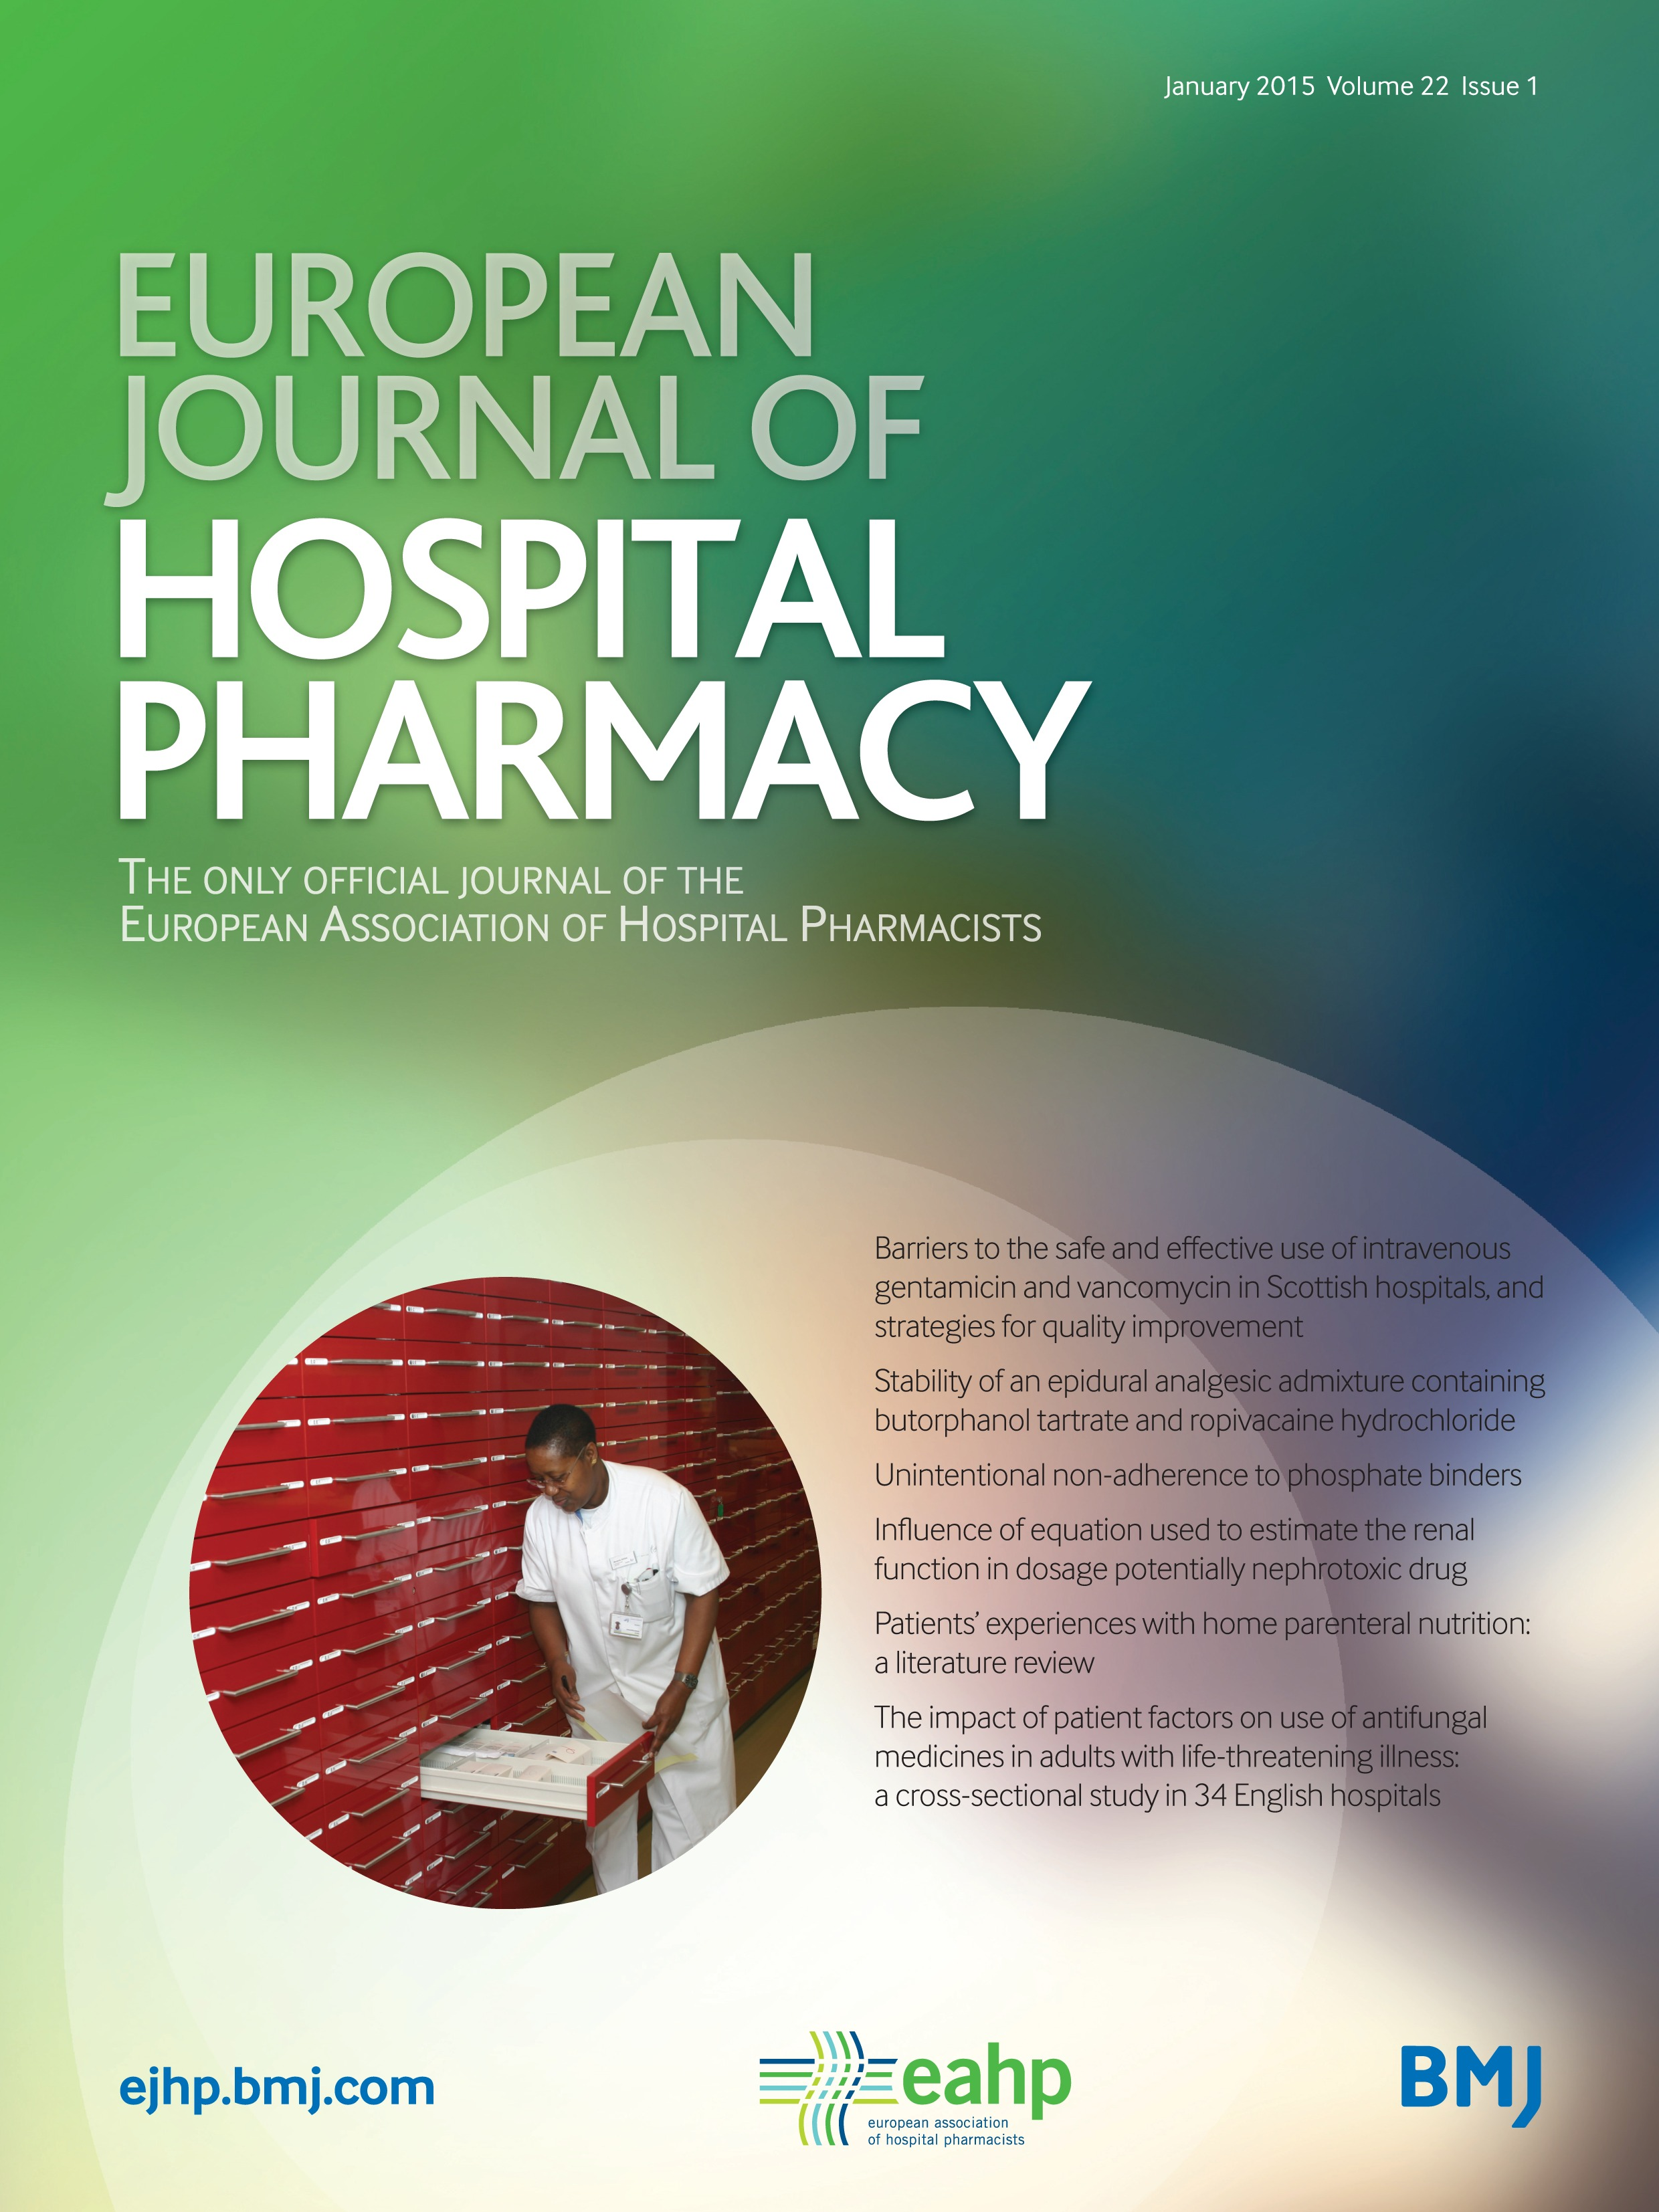 use of intravenous gentamicin and vancomycin